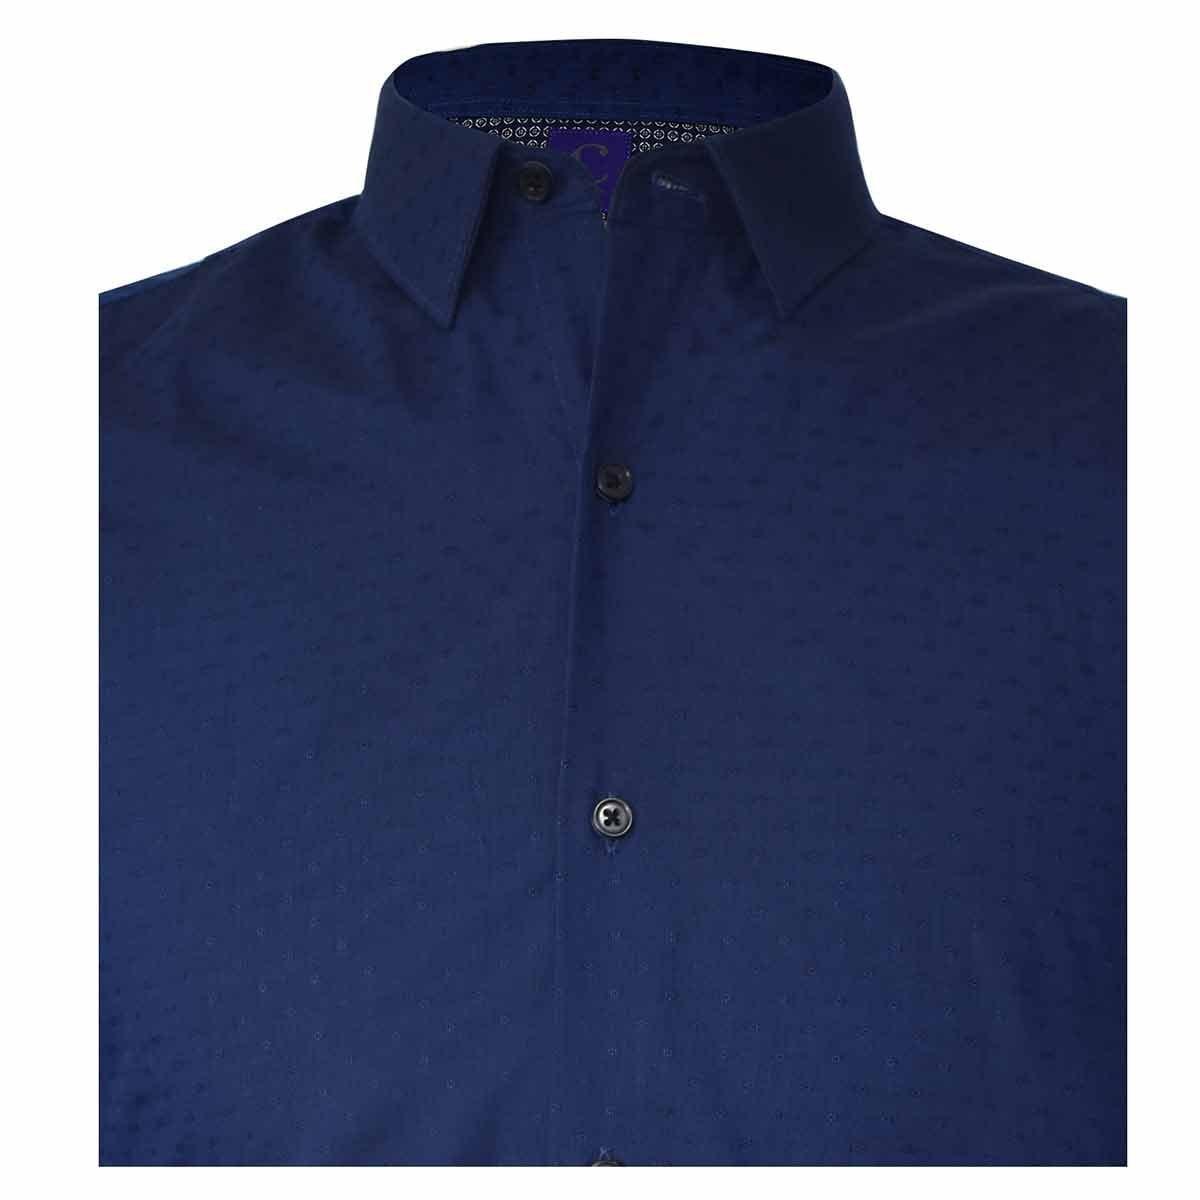 85cb79dd0e0 Camisa estampada c by cavalier